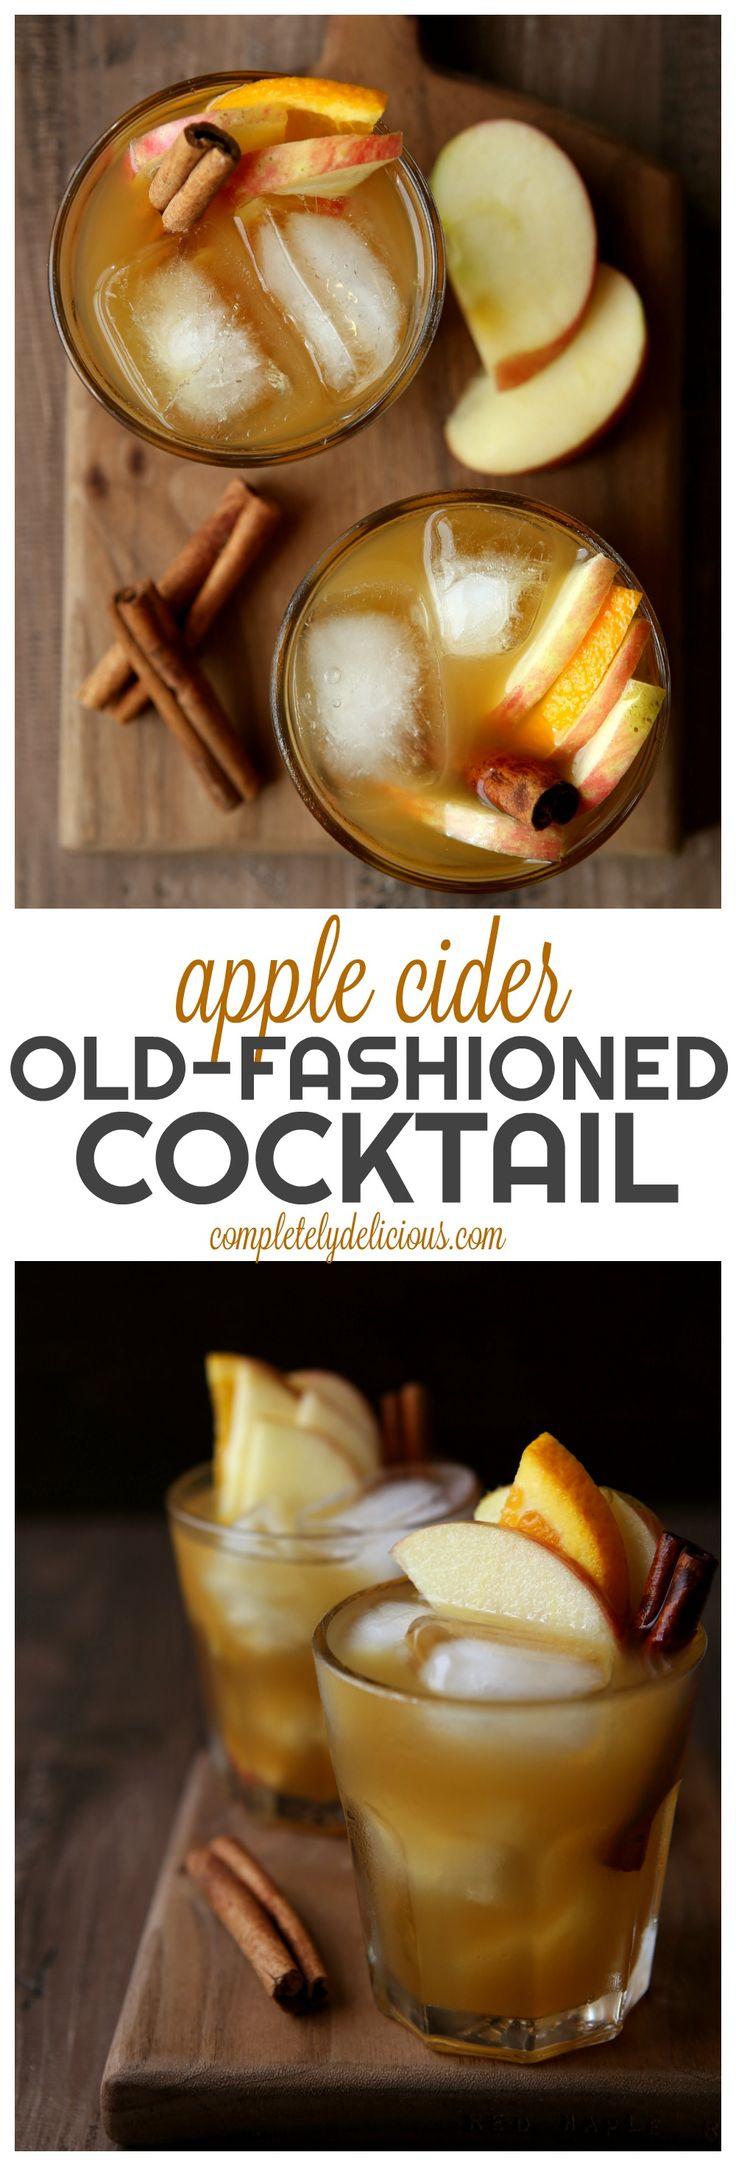 Apple Cider Old-Fashioned Cocktail